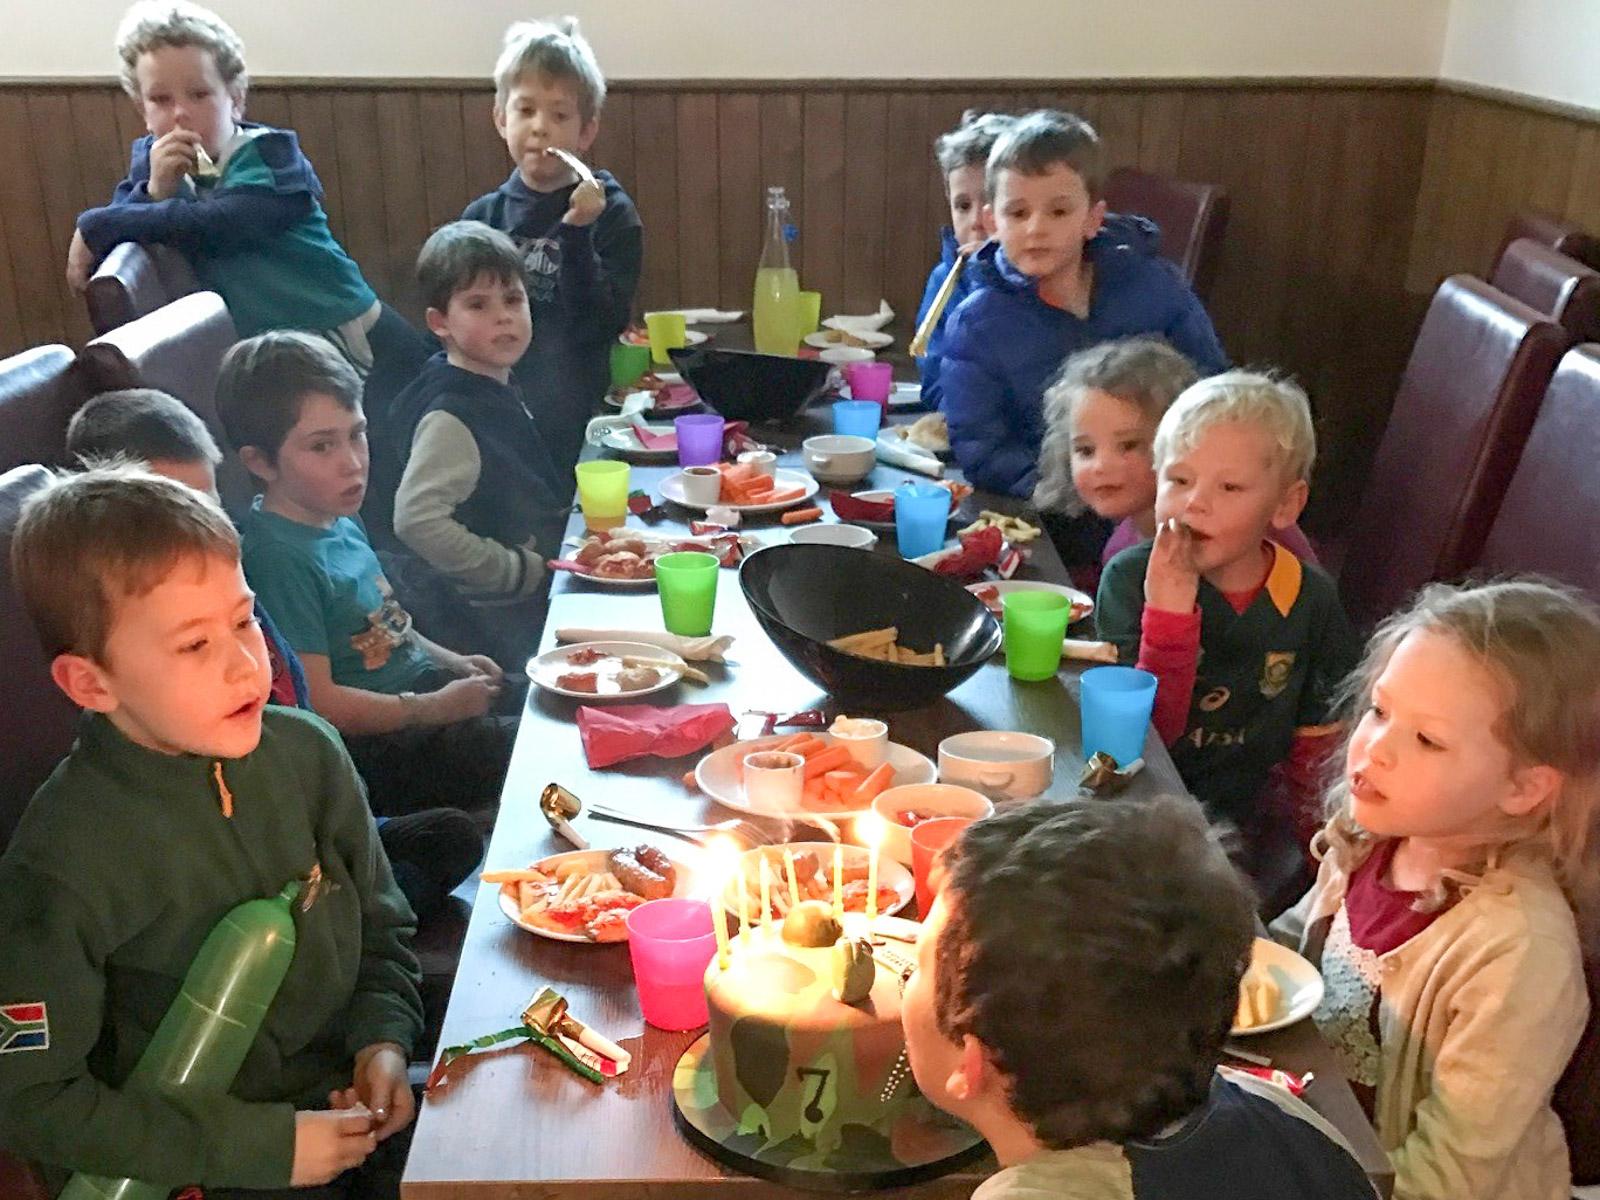 Conifox Edinburgh Birthday Party Venue For Kids Adults - Childrens birthday party ideas edinburgh